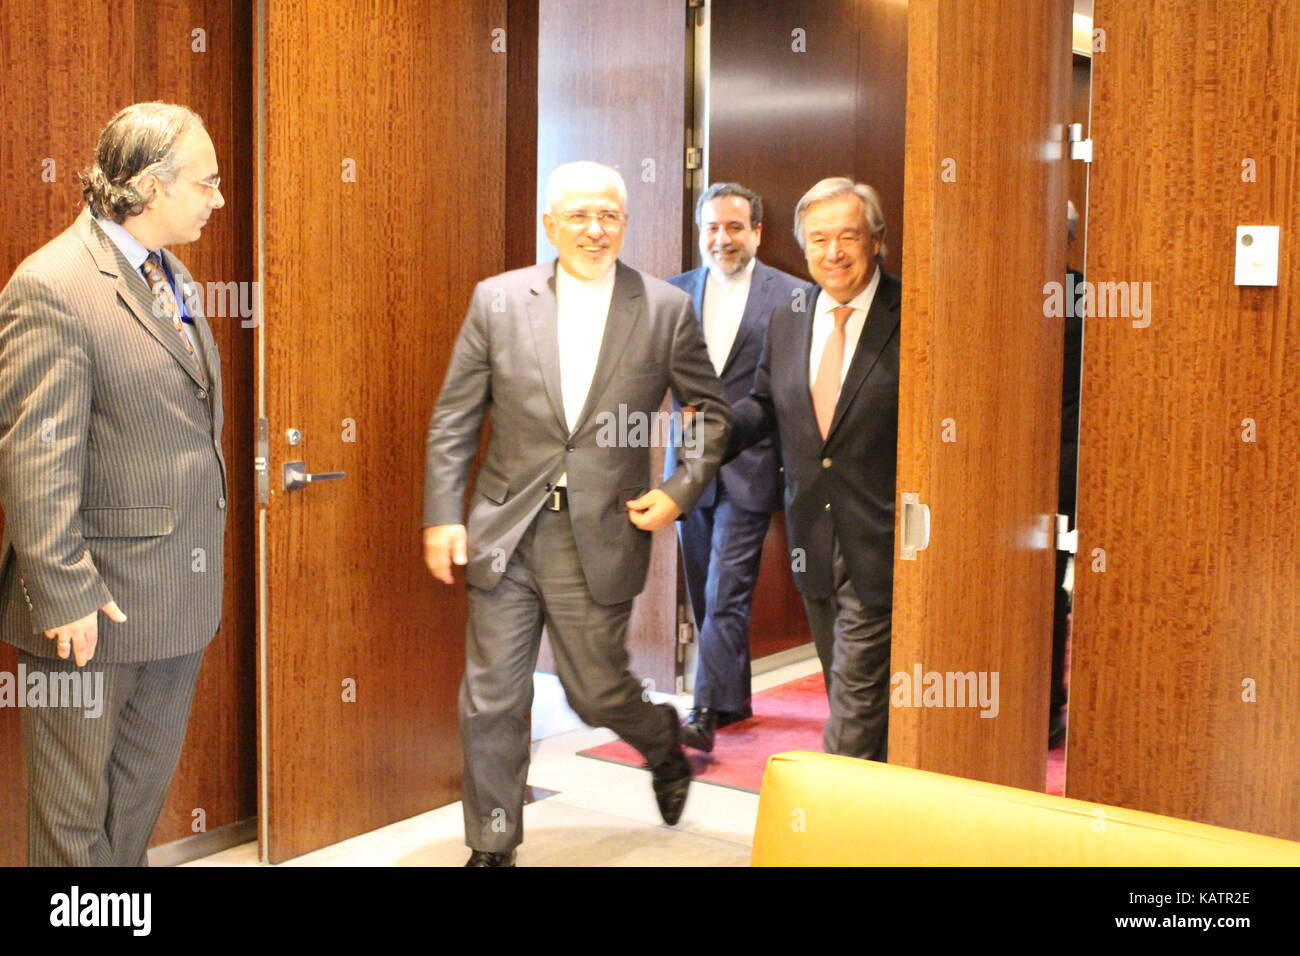 UN, New York, USA. 27th Sept, 2017. Iran's Foreign Minister Mohammad Javad Zarif met UN Secretary-General Antonio Stock Photo